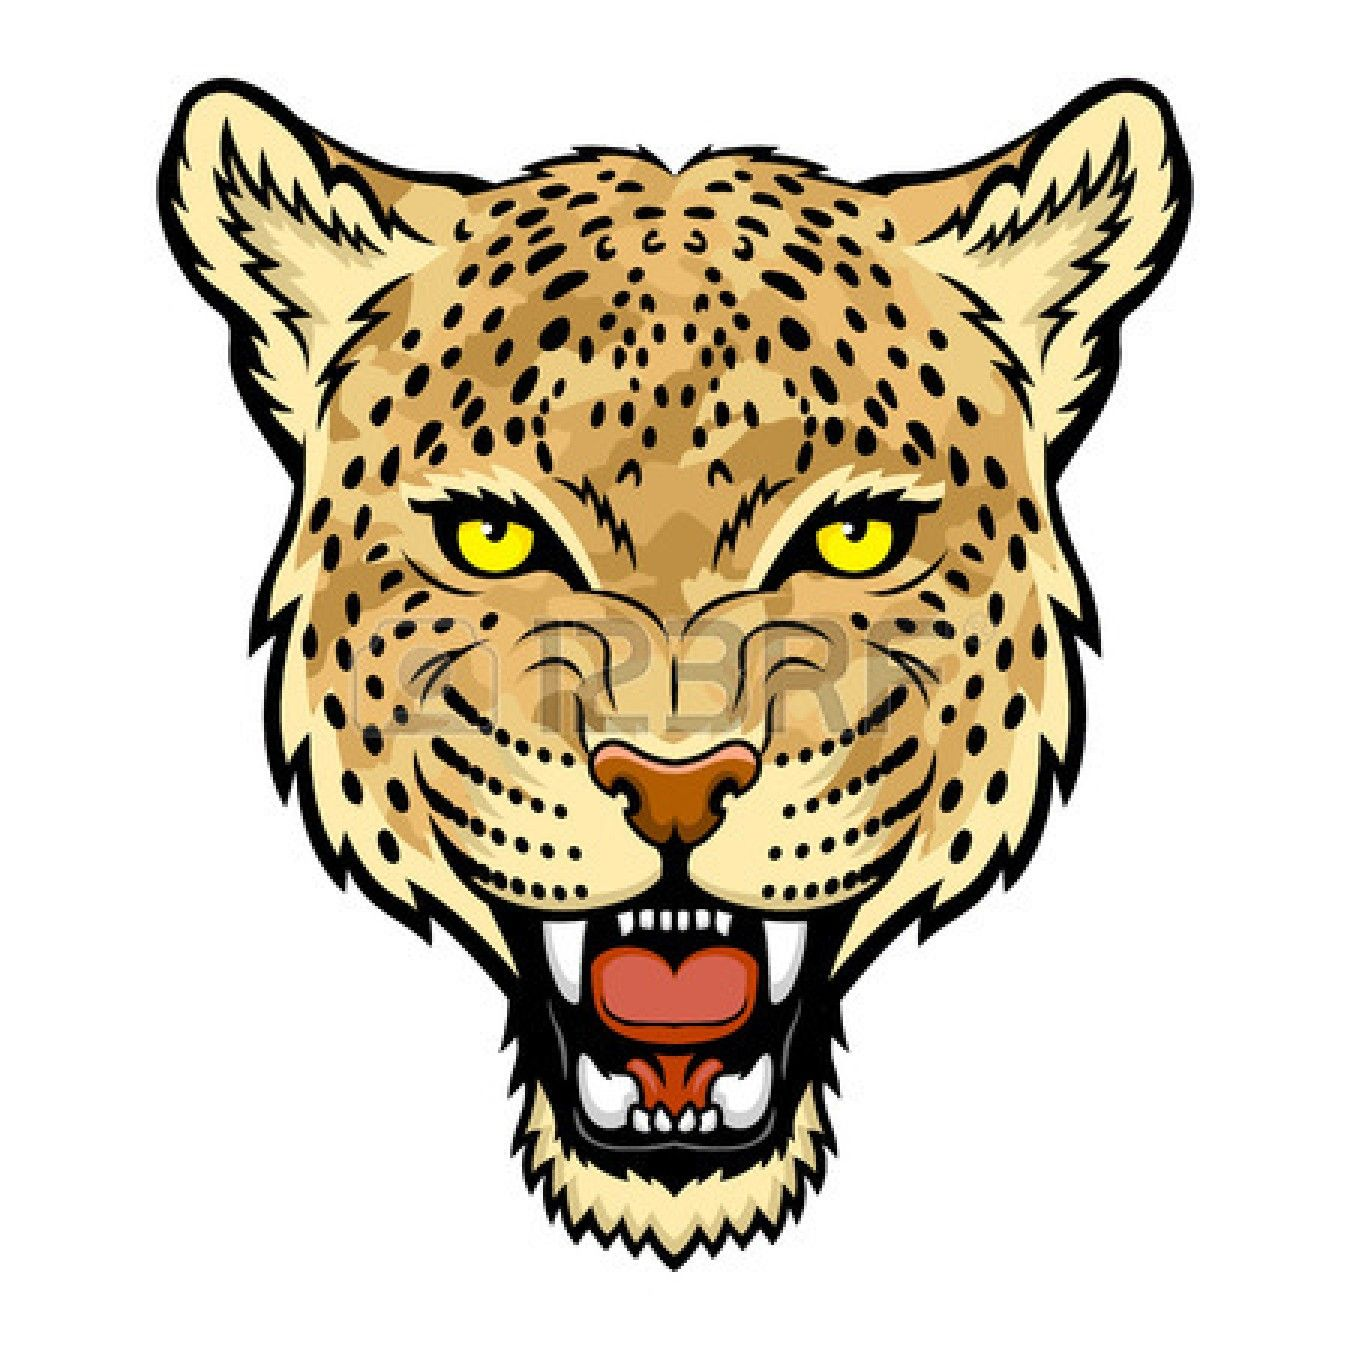 ocelot-clip-art-23856230-a-leopard-head.jpg (1350×1350) | clipart ... for Clipart Leopard Face  303mzq